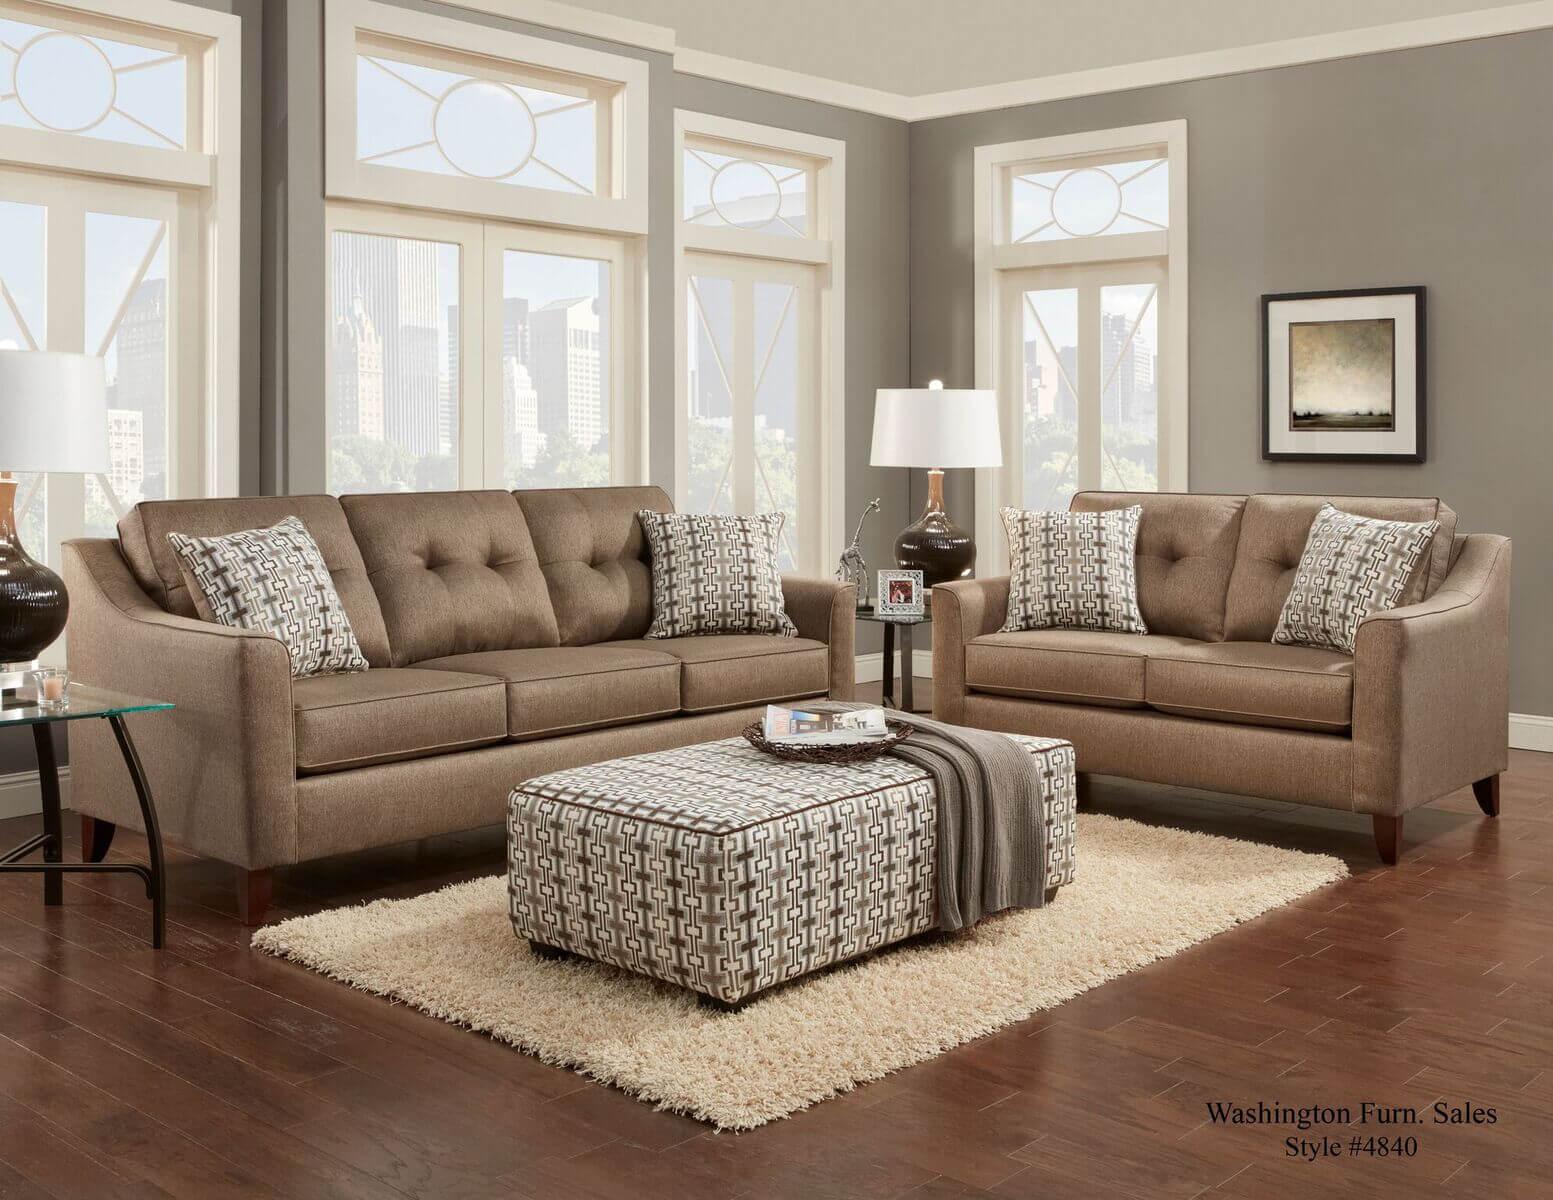 oatmeal sofa tylosand sleeper cover j1 3853 afw thesofa